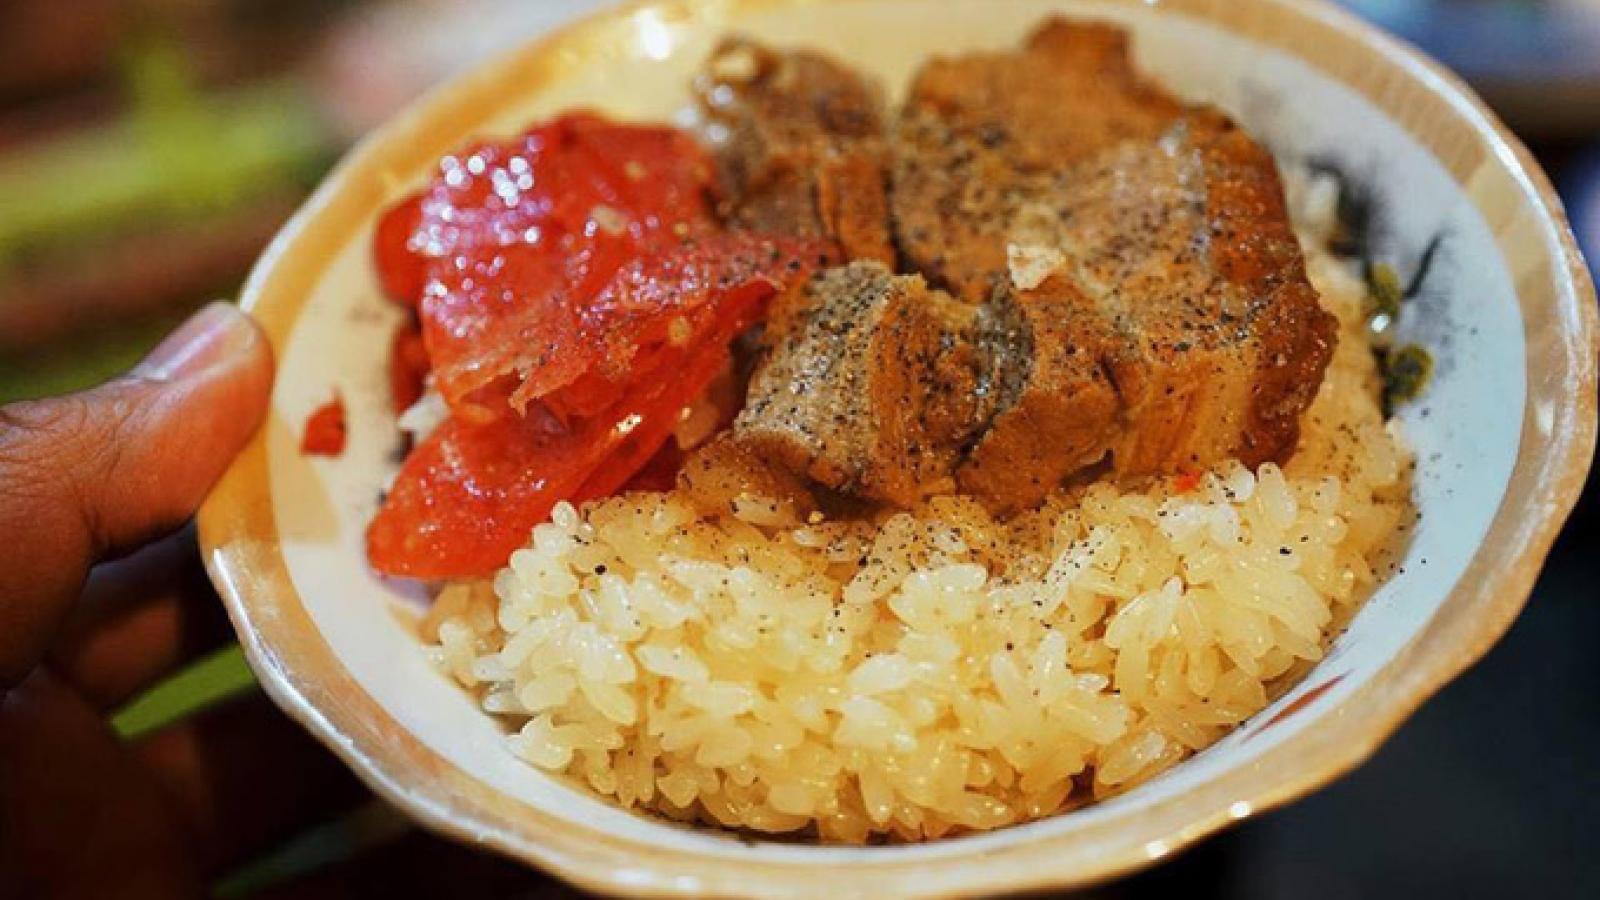 Downtown Hanoi harbors a sticky rice secret